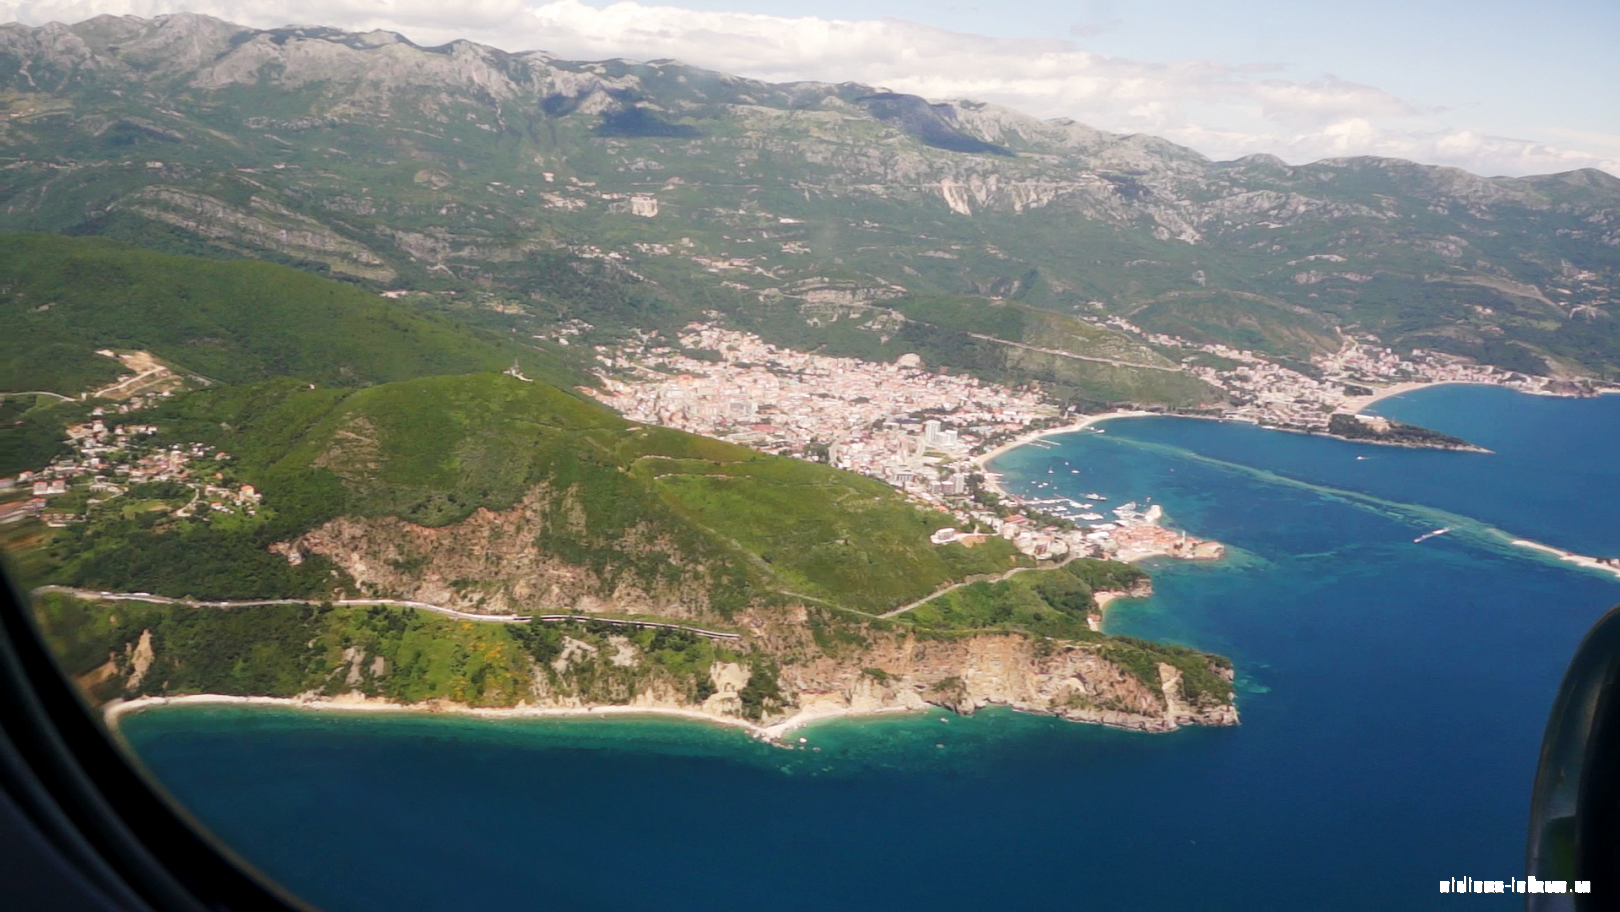 Вид на морское побережье Черногории перед посадкой в аэропорту Тиват